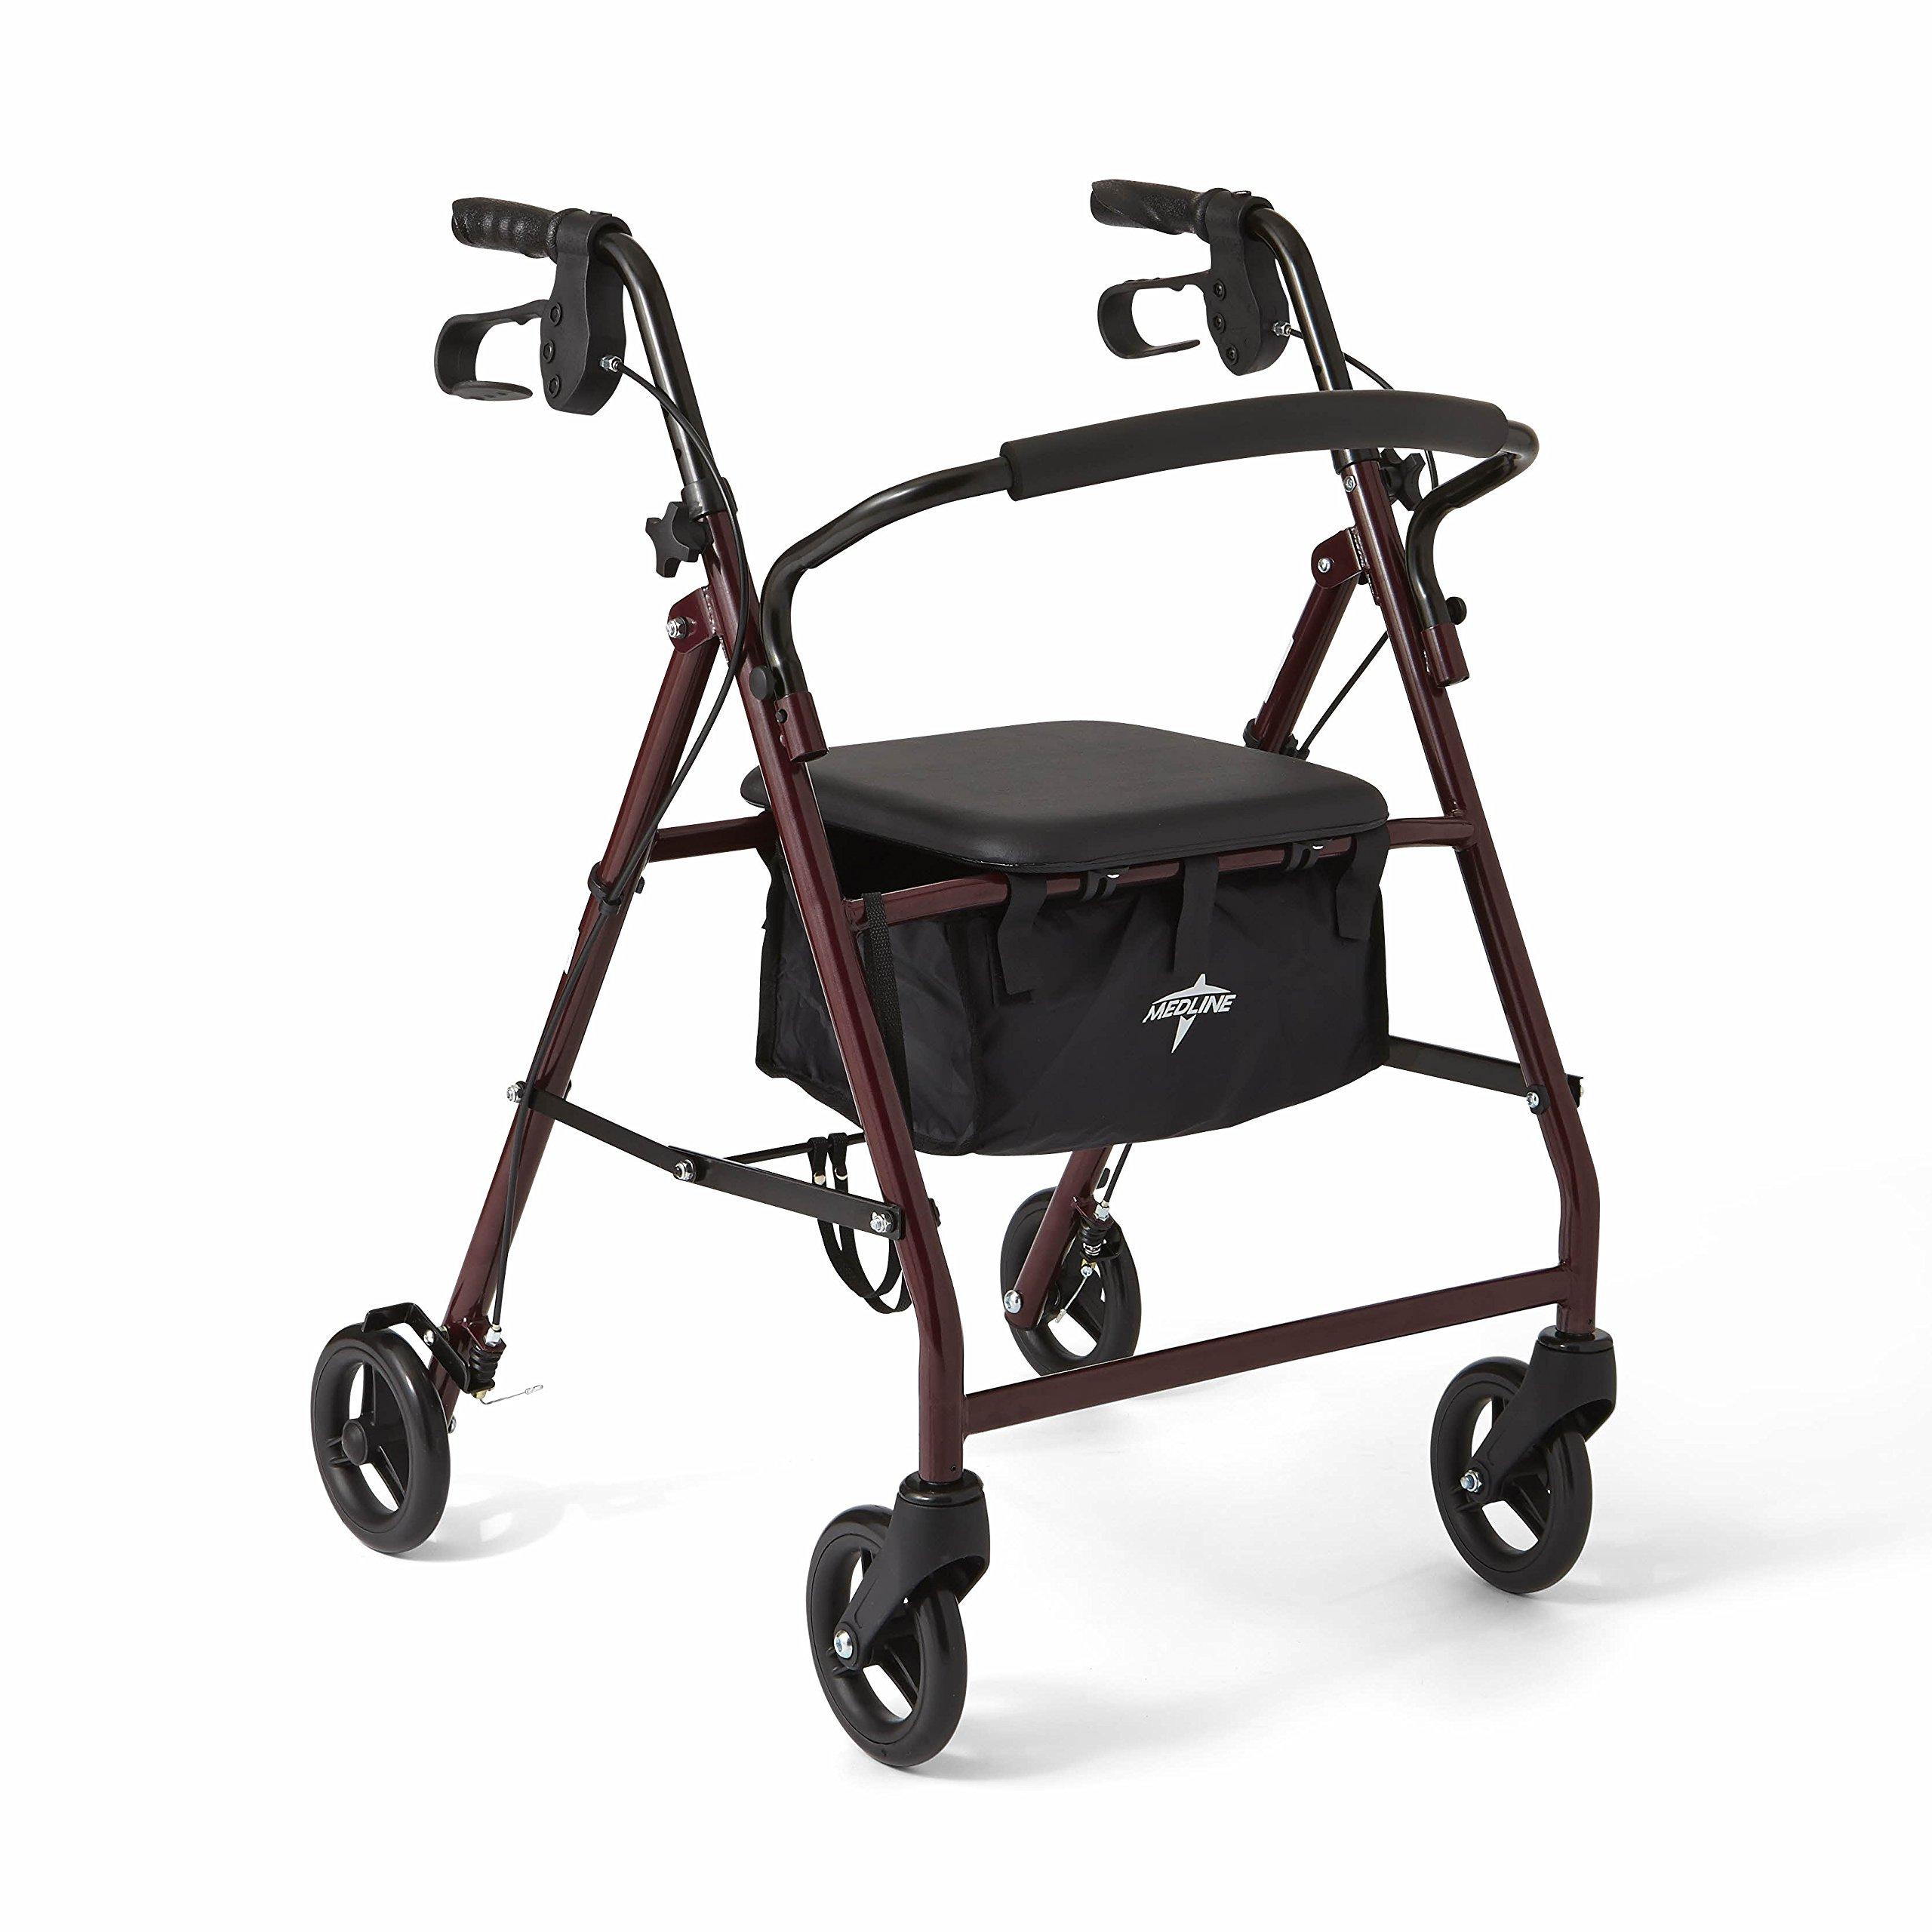 "Medline Steel Foldable Adult Rollator Mobility Walker with 6"" Wheels, Burgundy"